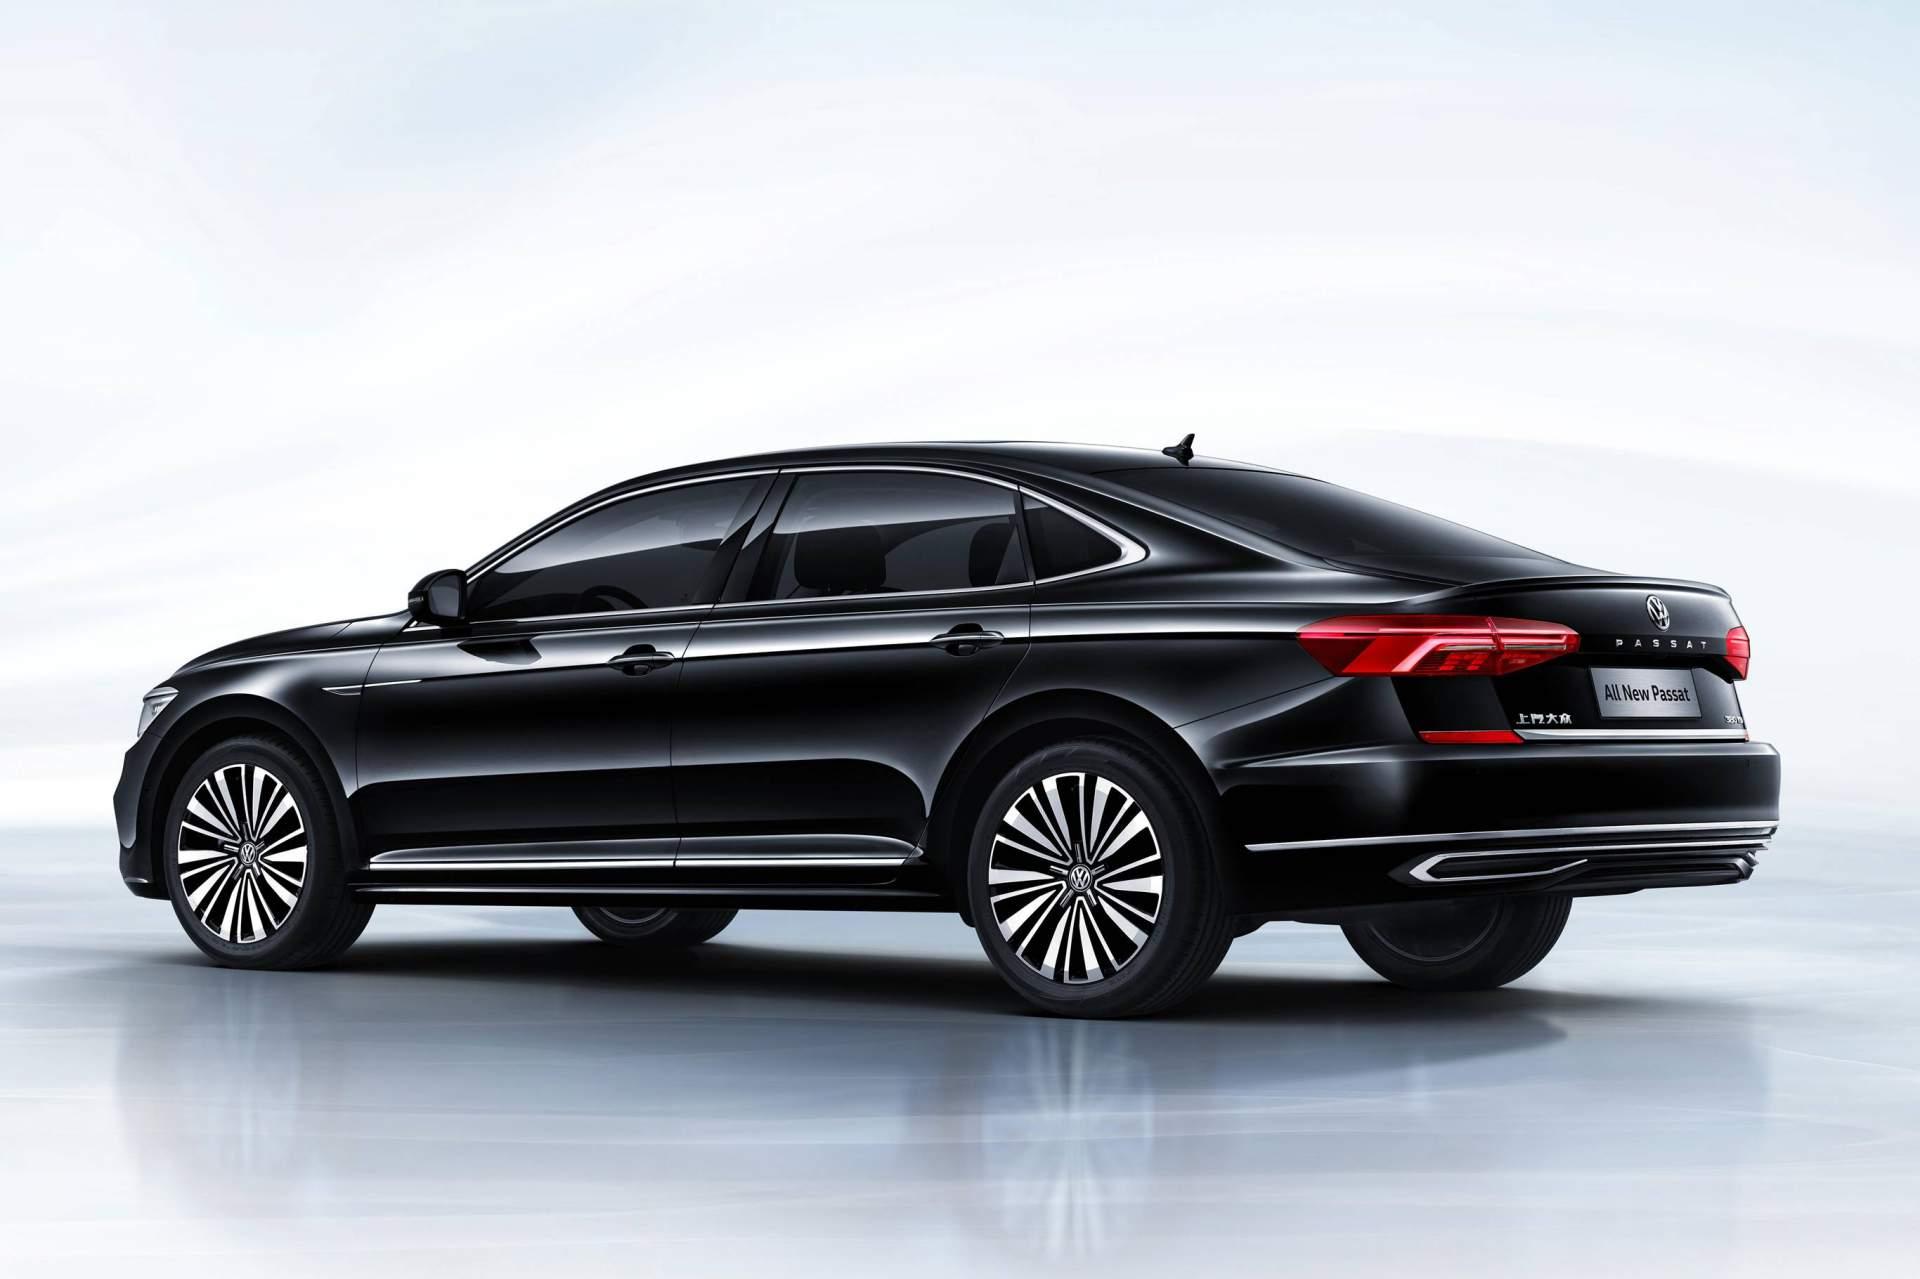 2019 Volkswagen Passat Revealed In China Previews US